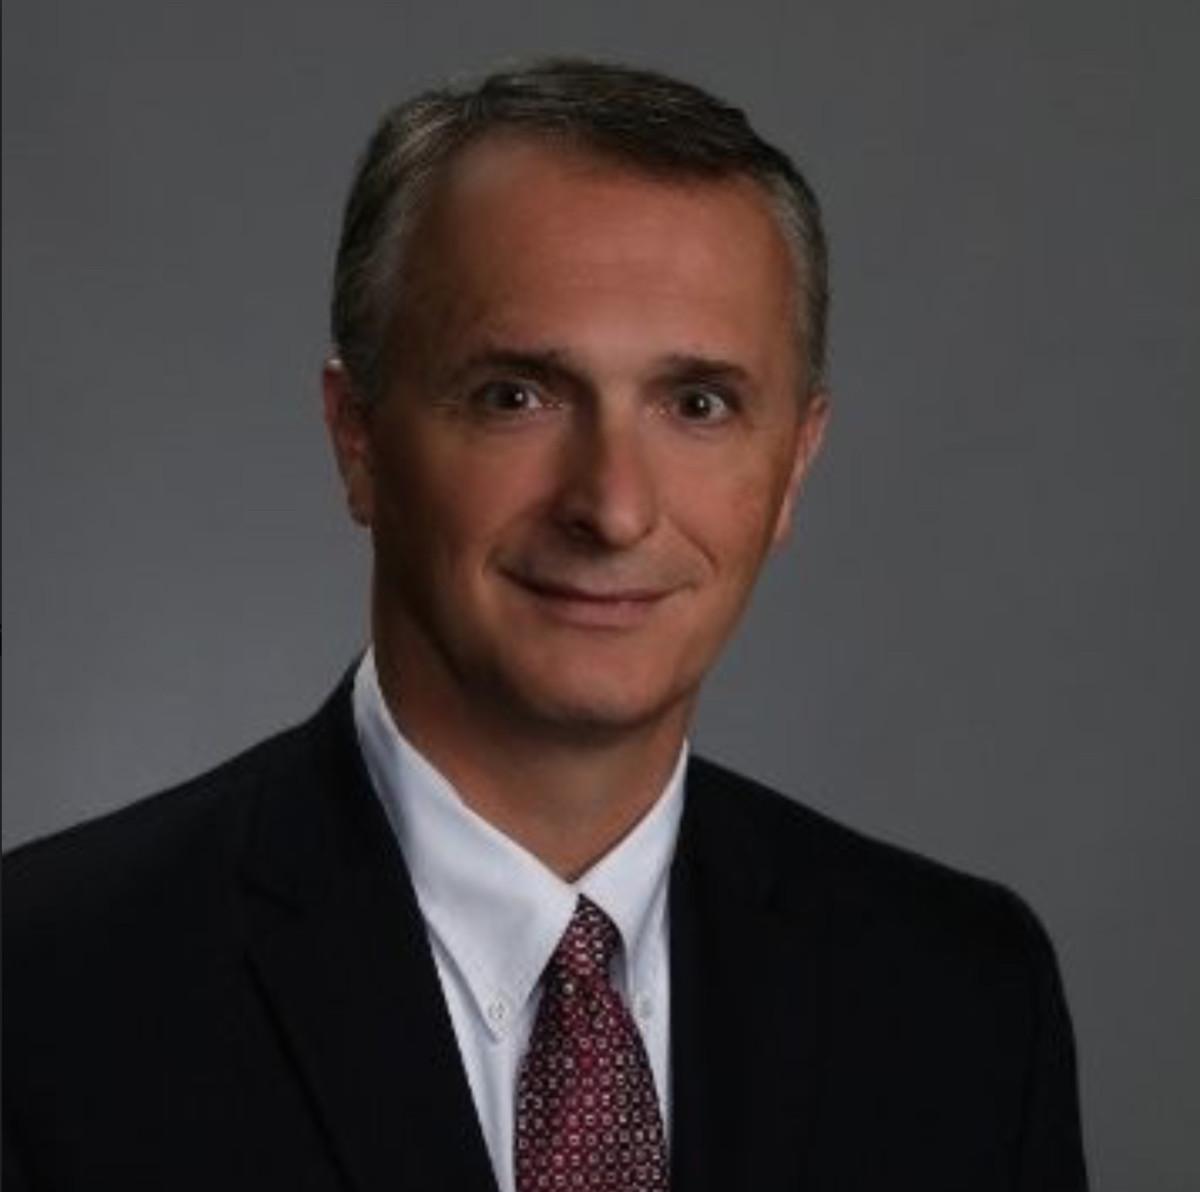 Brian Frey will serve as Brunswick's treasurer.